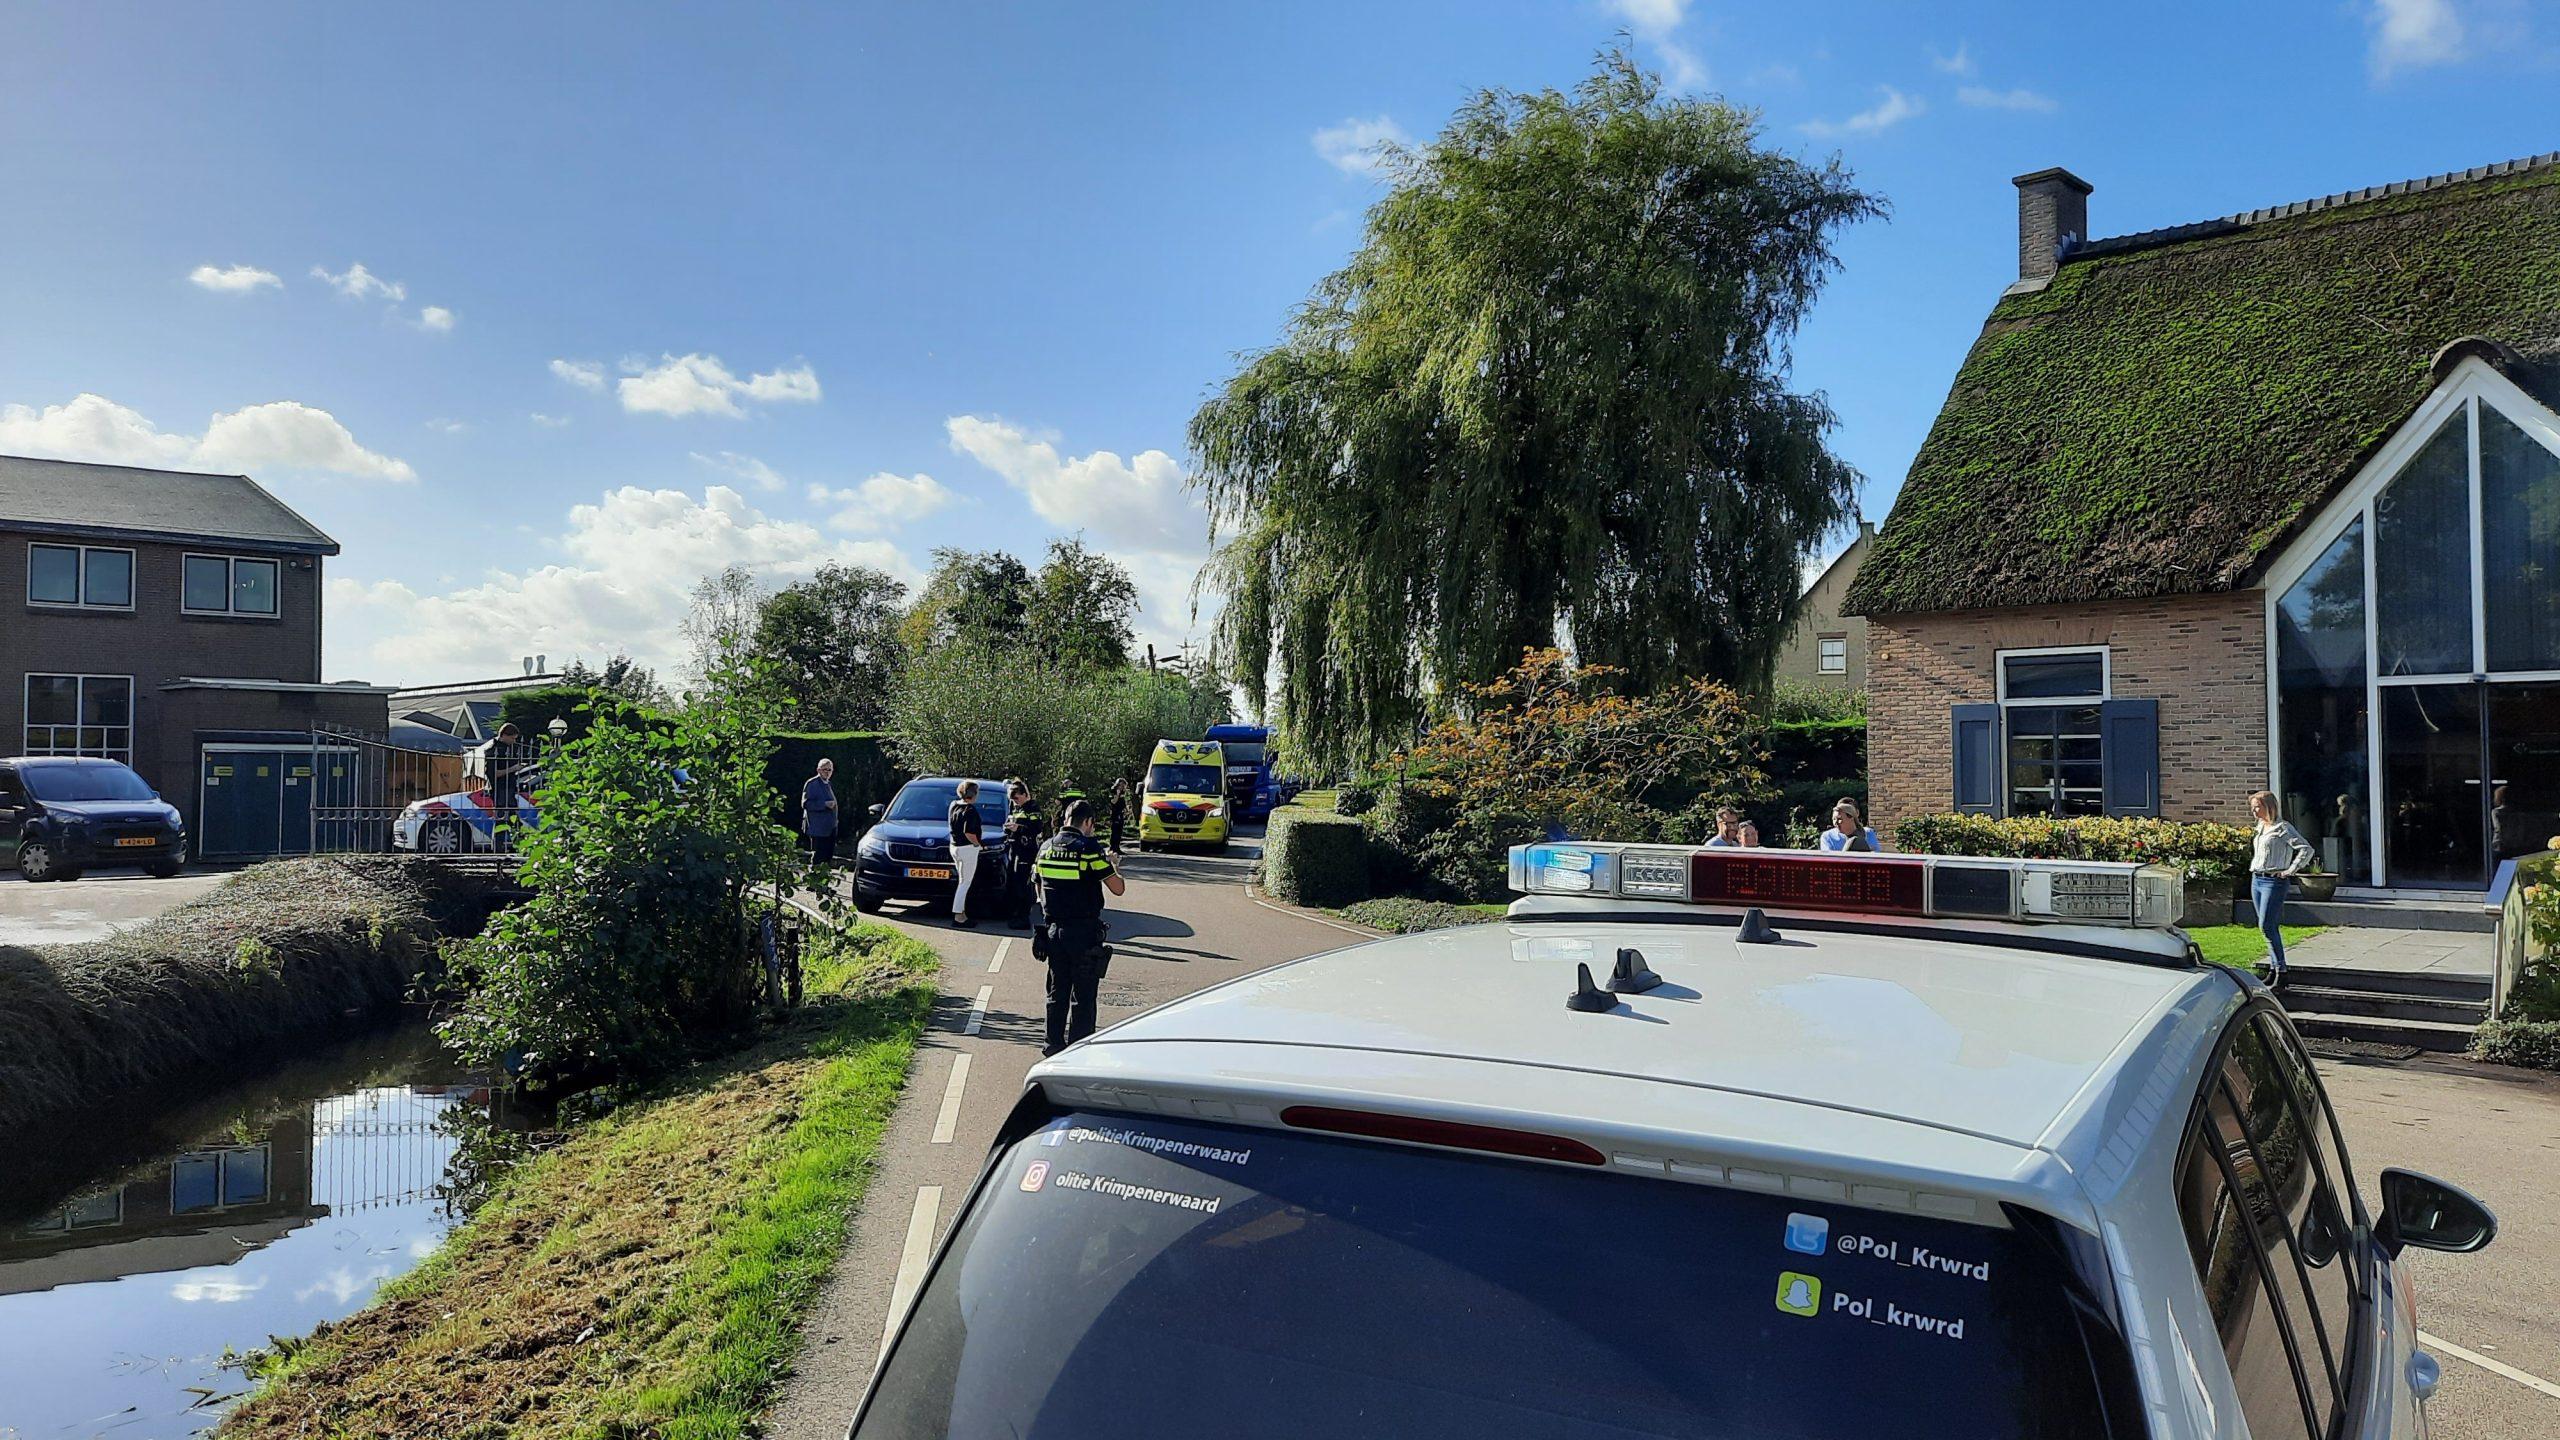 Scooterrijder gewond na botsing met auto in Bergambacht